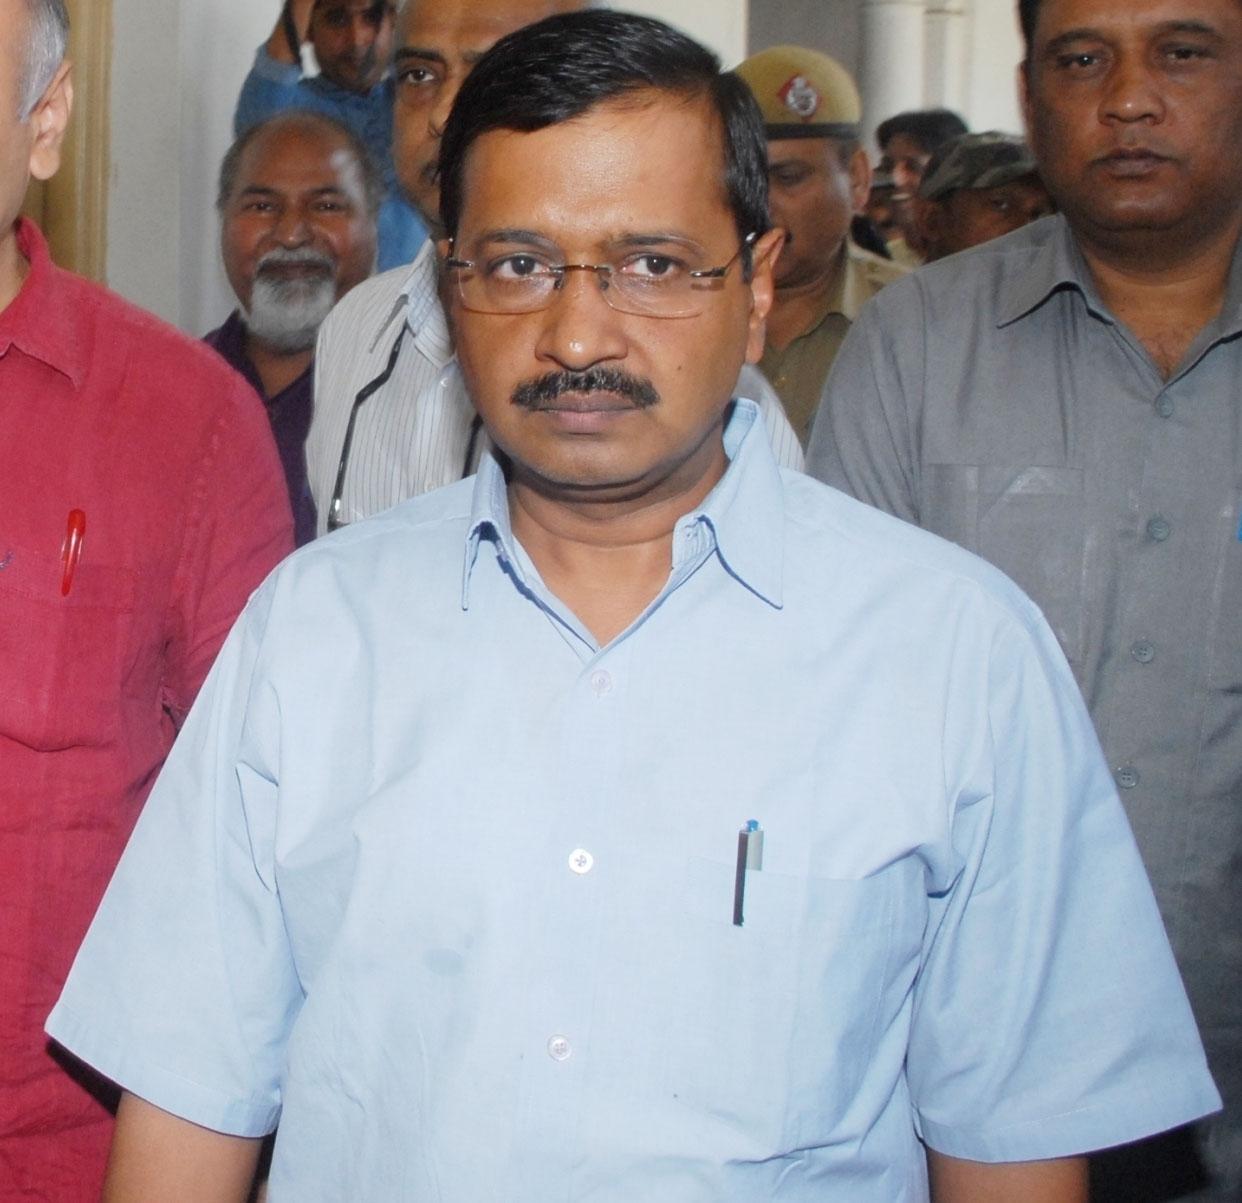 Kejriwal challenges Shah for a public debate at Ramlila Maidan